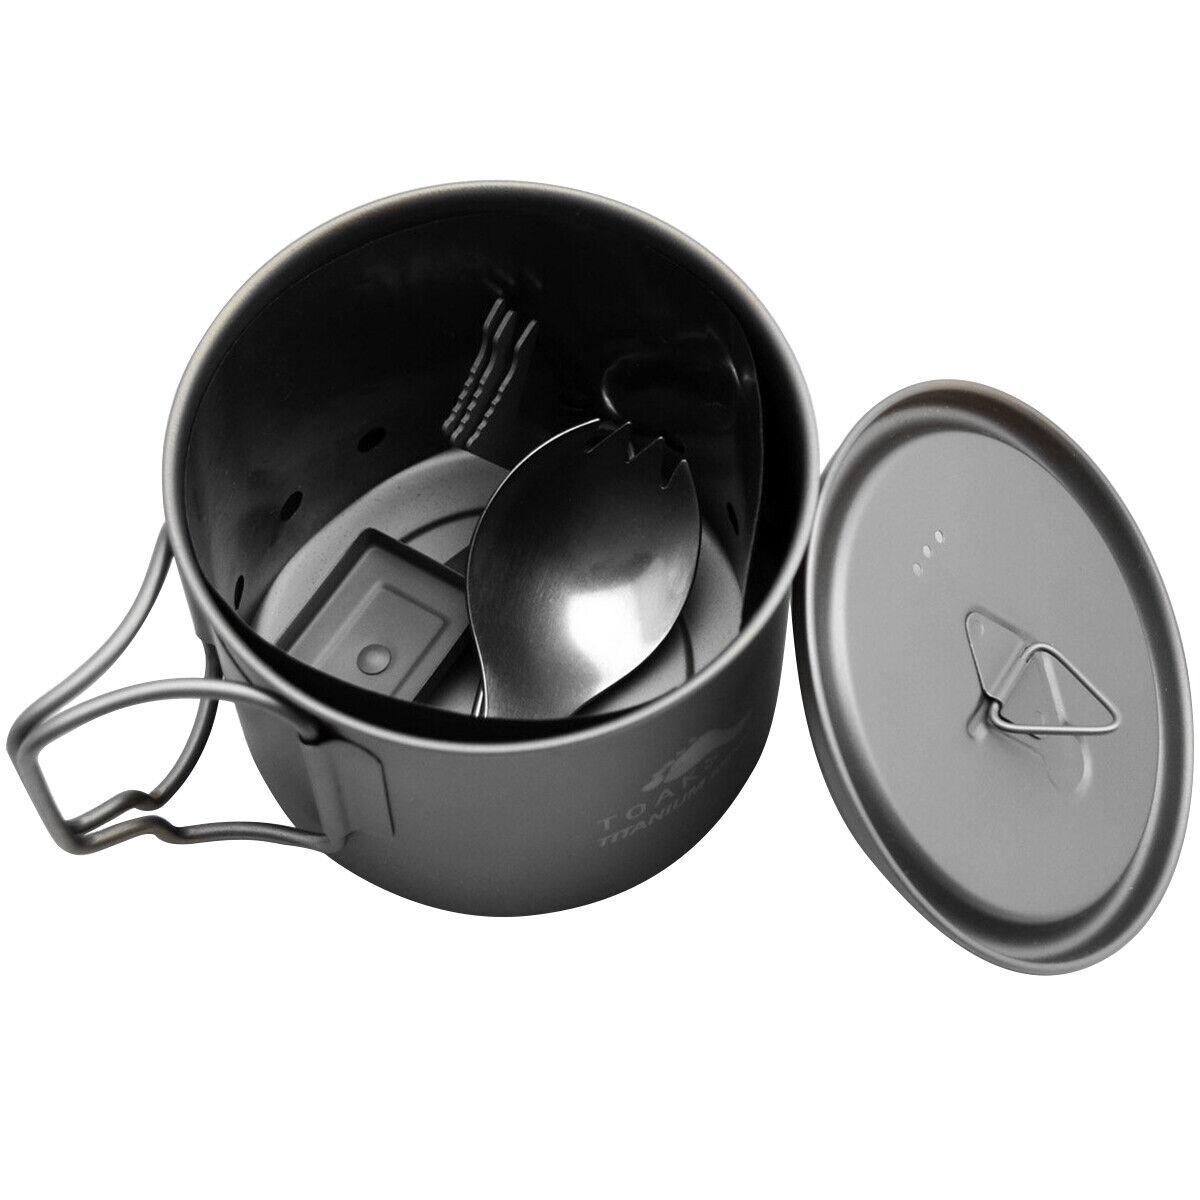 TOAKS Ultralight Titanium Solid Fuel Cook System CS-01 - Outdoor Camping